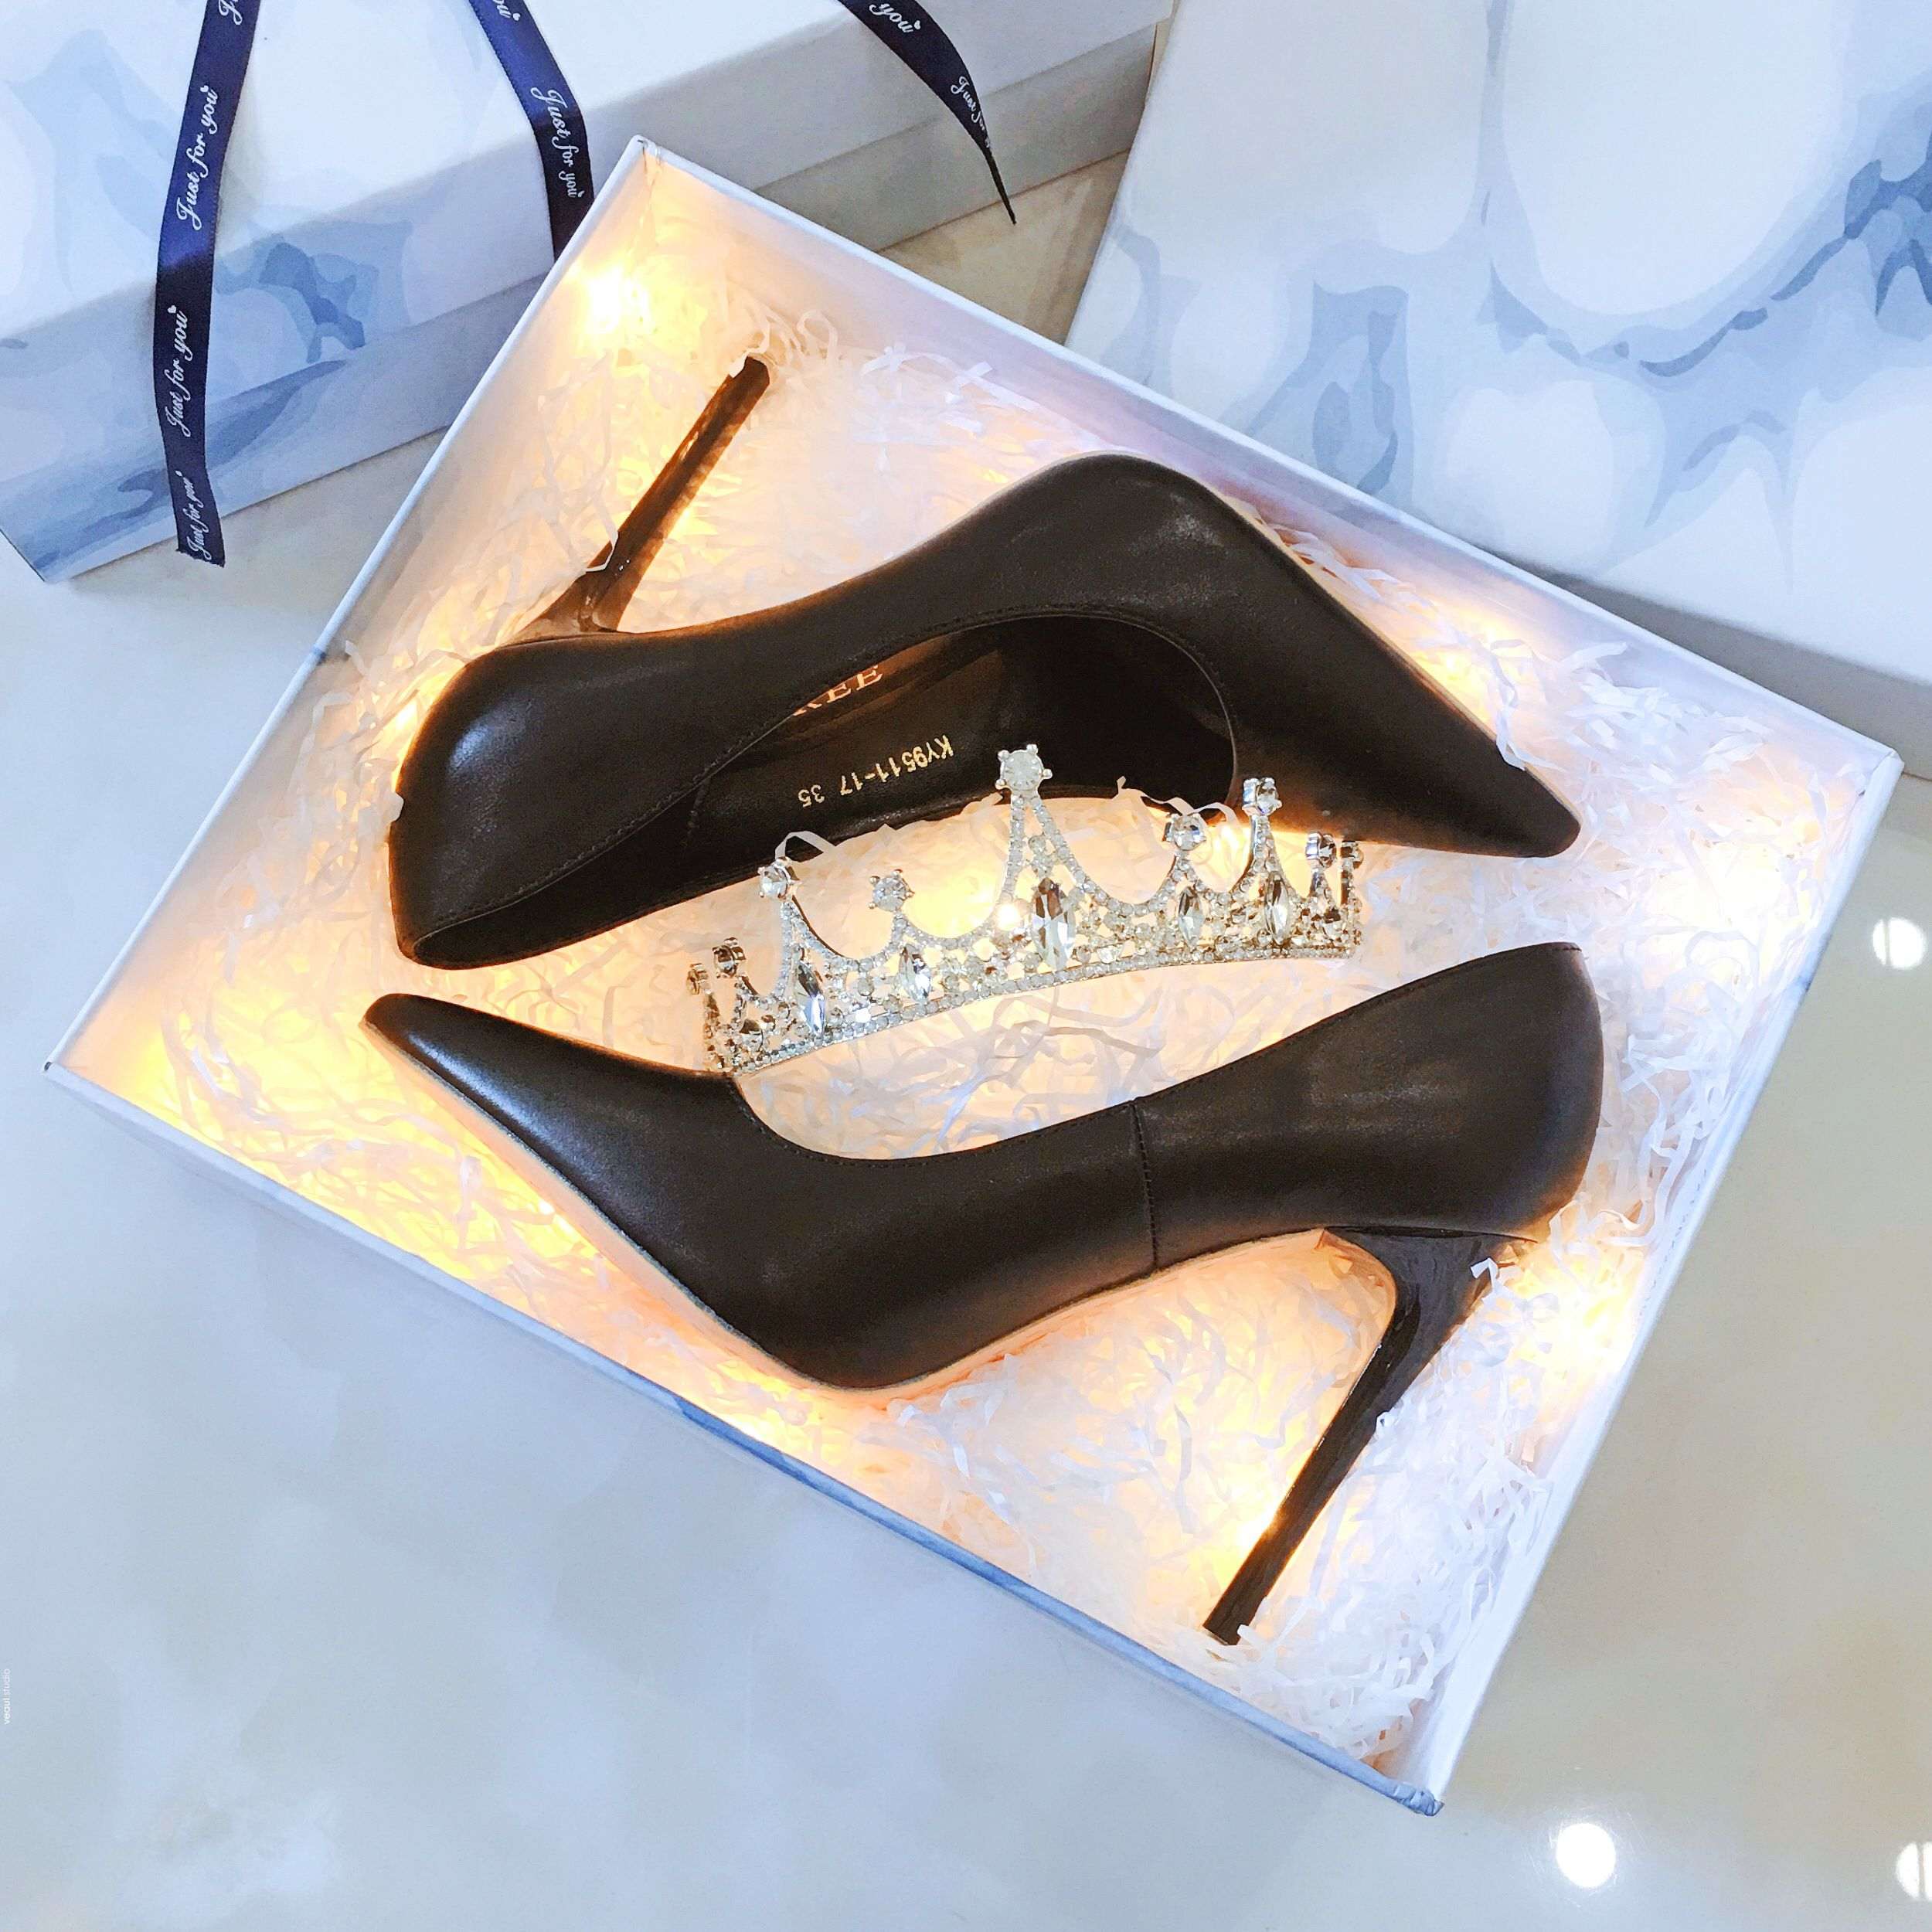 Classy Black Evening Party Pumps 2019 10 cm Stiletto Heels Pointed Toe Pumps